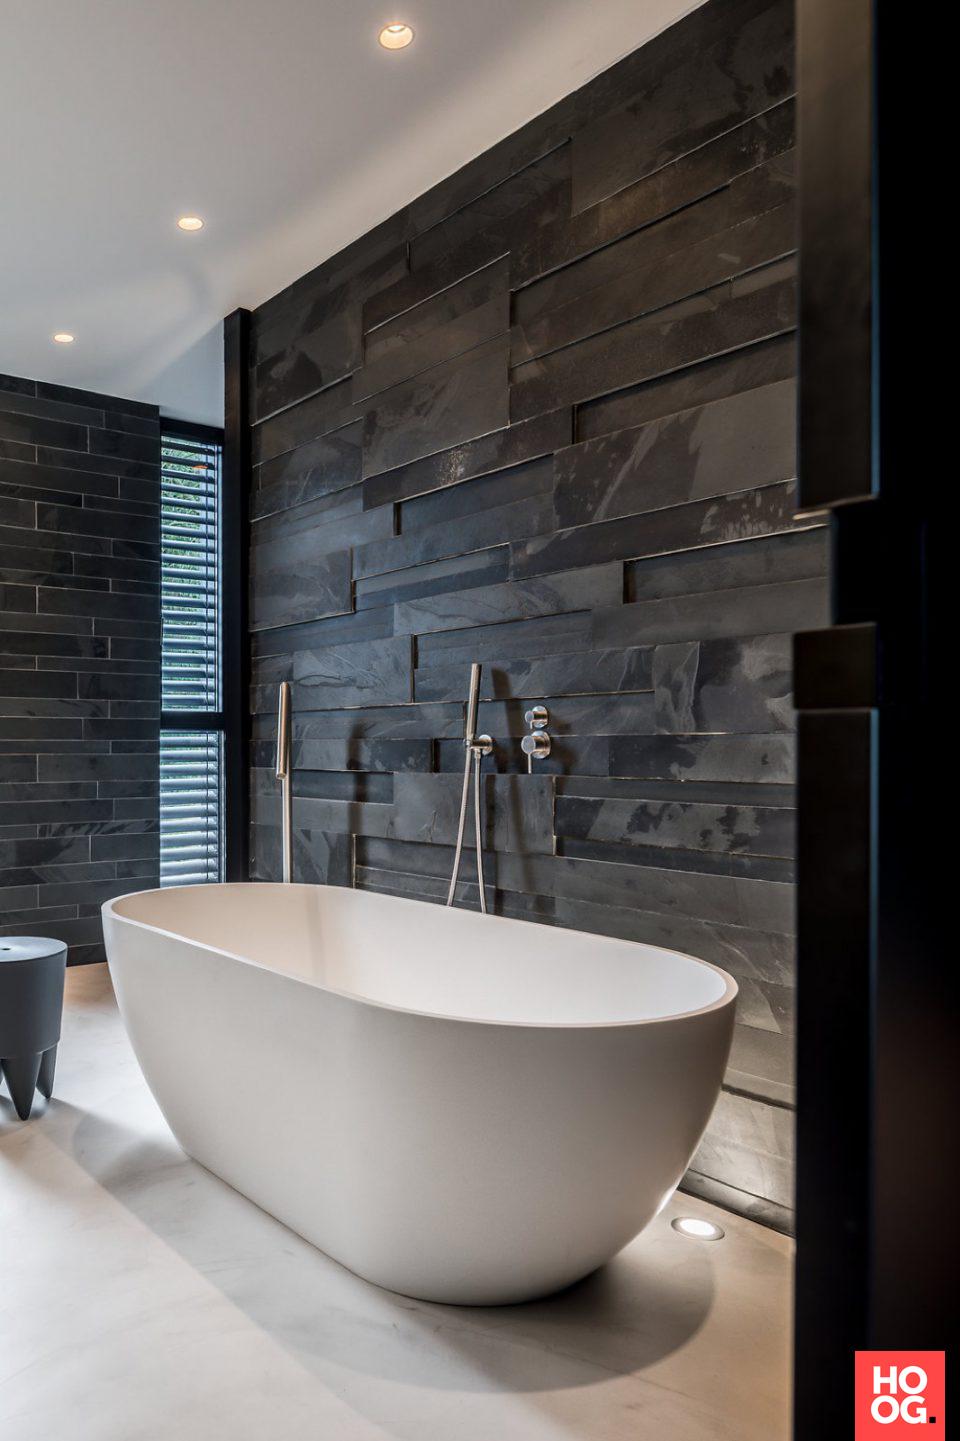 luxe badkamer | Bathroom | Pinterest - Badkamer, Interieur en Bad